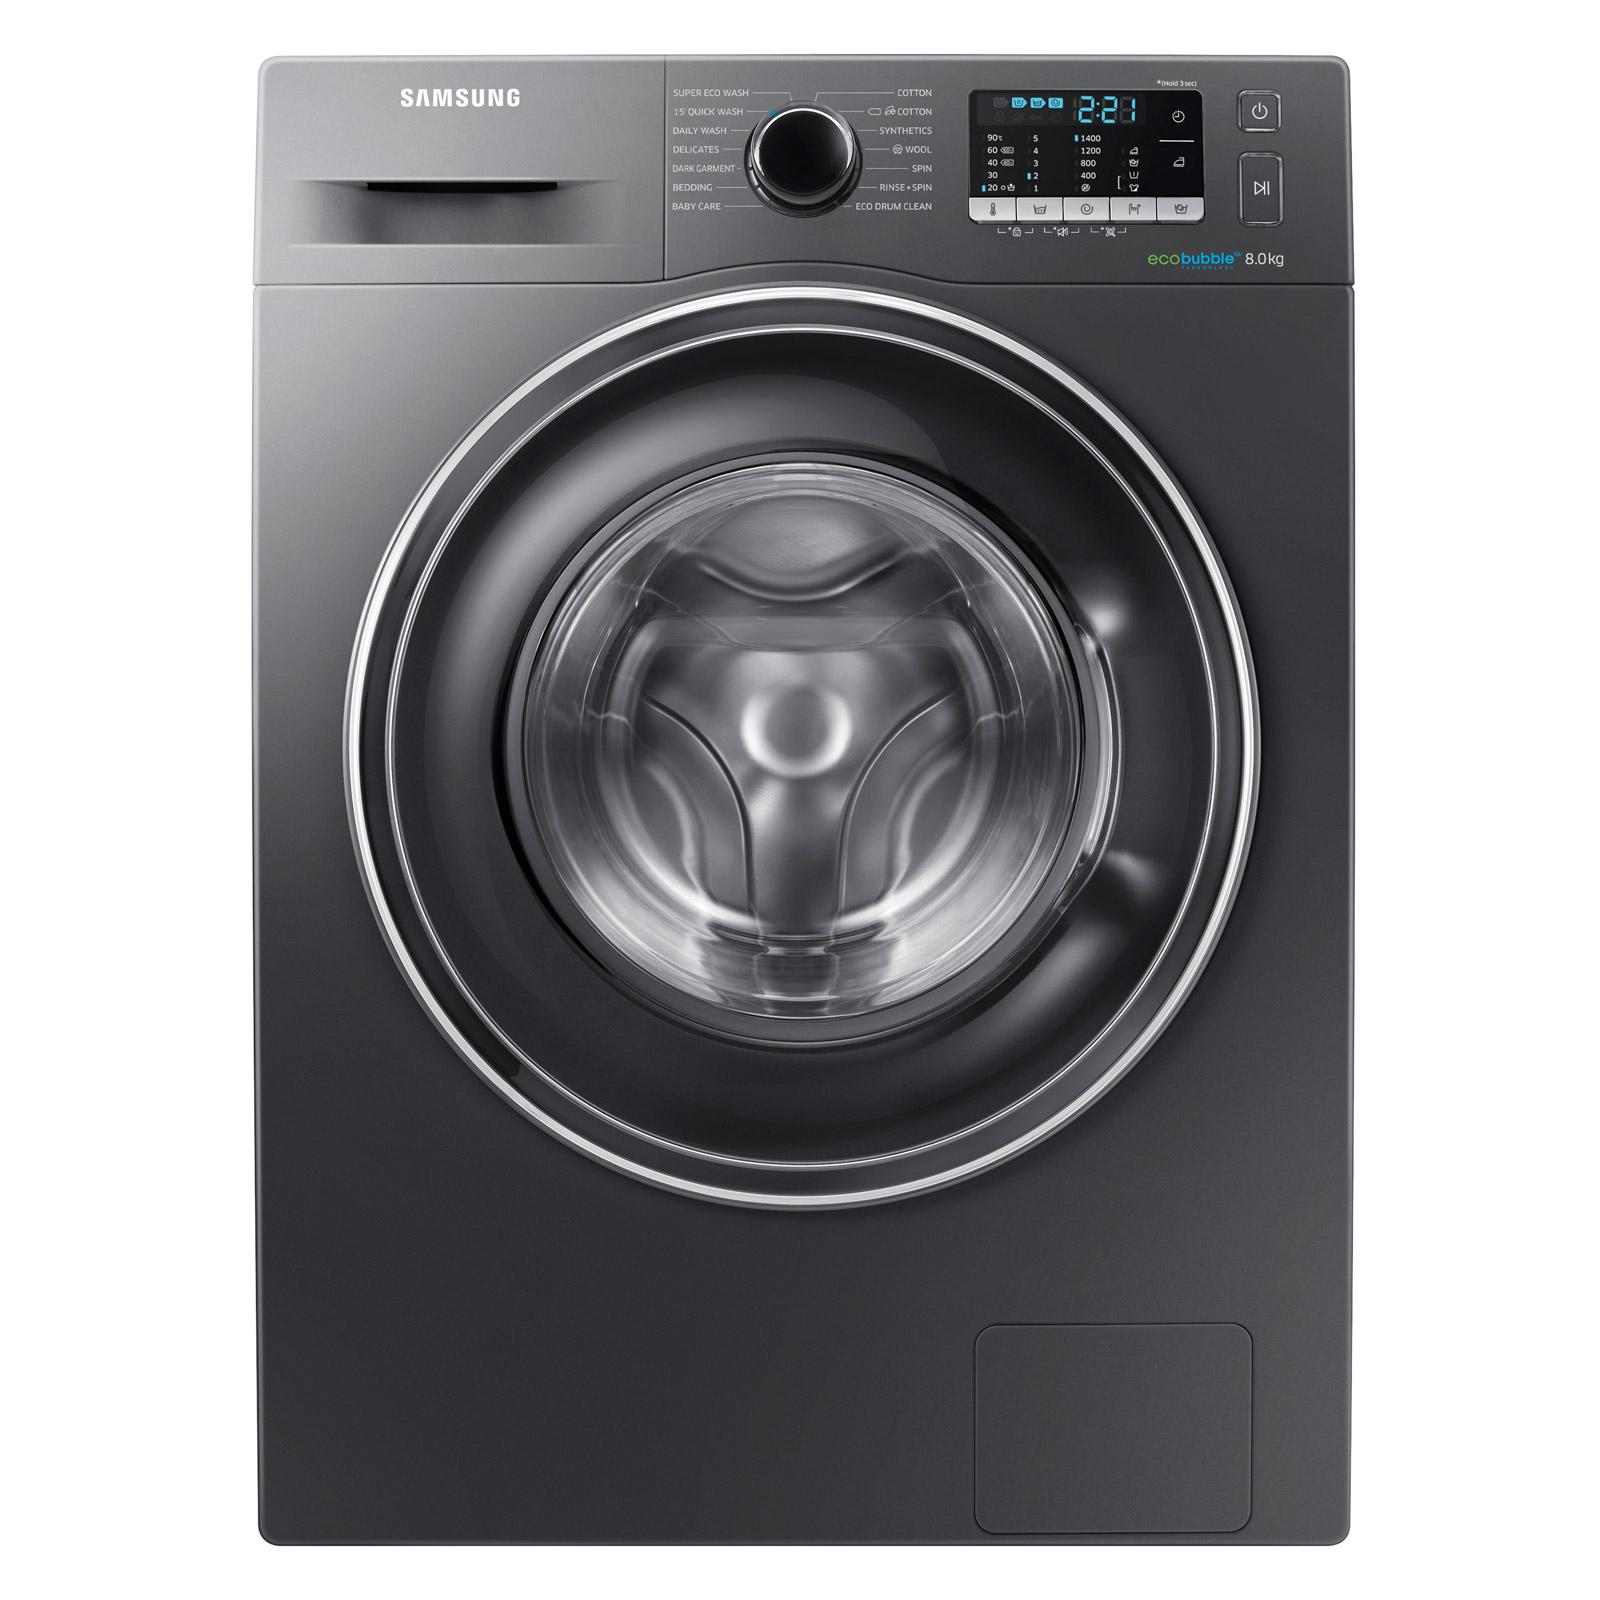 Samsung WW80J5555EX ECO BUBBLE Washing Machine in Graphite 1400rpm 8kg A+++ £349 @ Sonic Direct